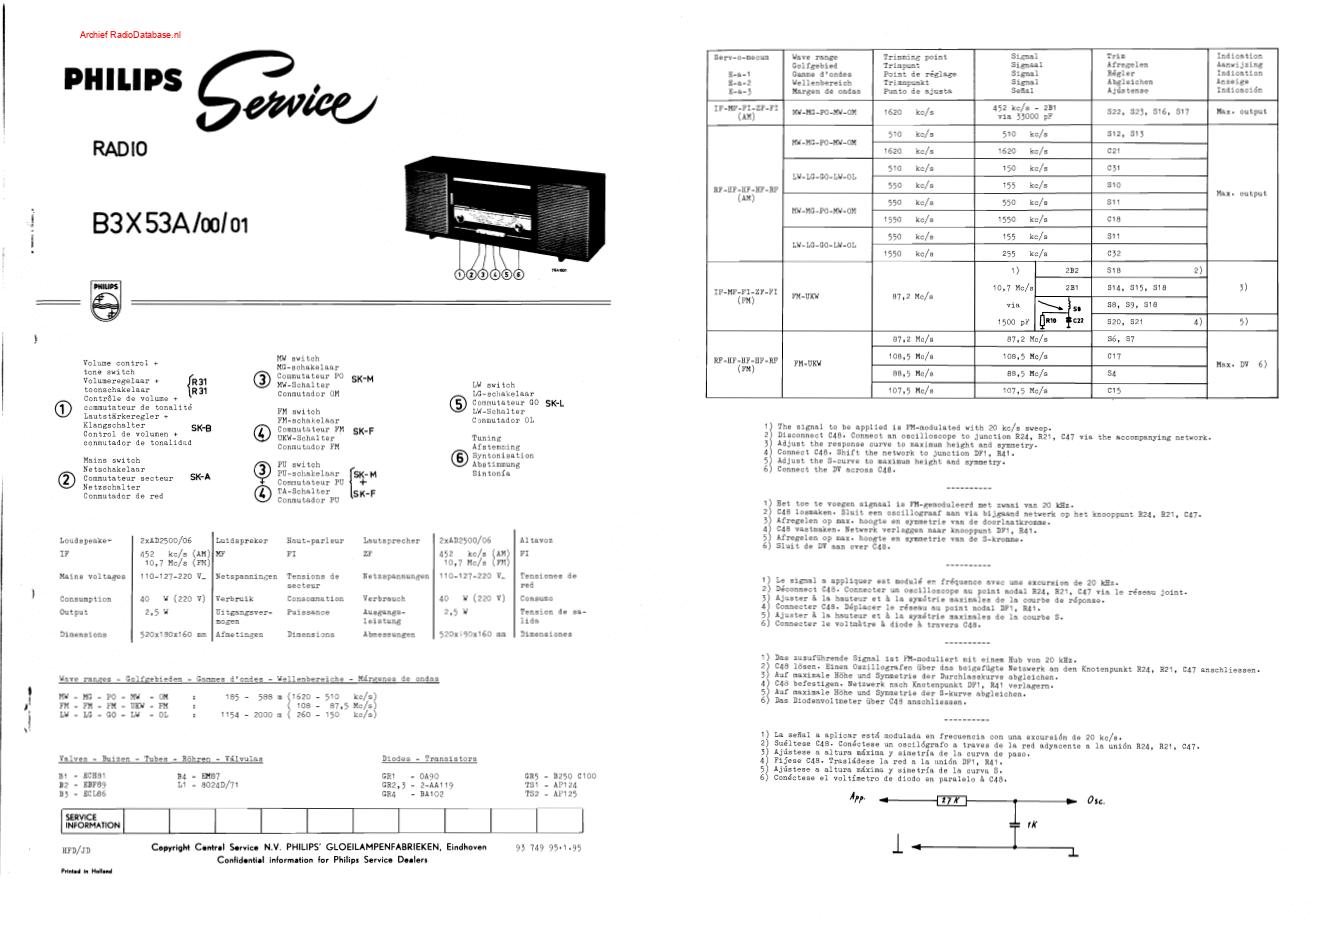 PHILIPS飞利浦B3X53A电子管收音机维修手册